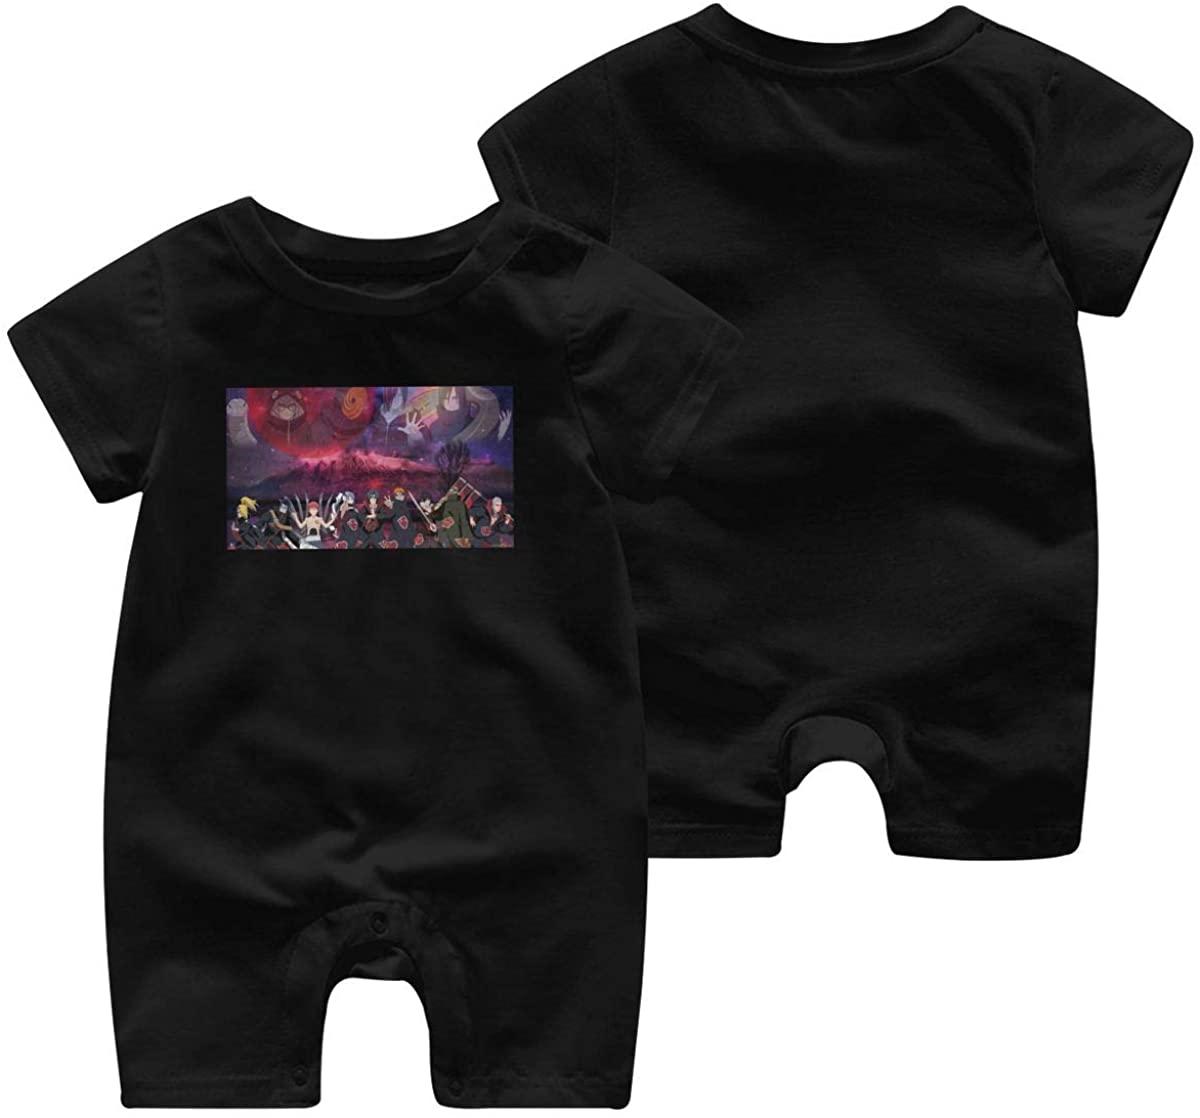 Gbyuhjbujhhjnuj Baby Naruto Graphic One-Piece Organic Cotton Cute Infant Short Sleeve Romper